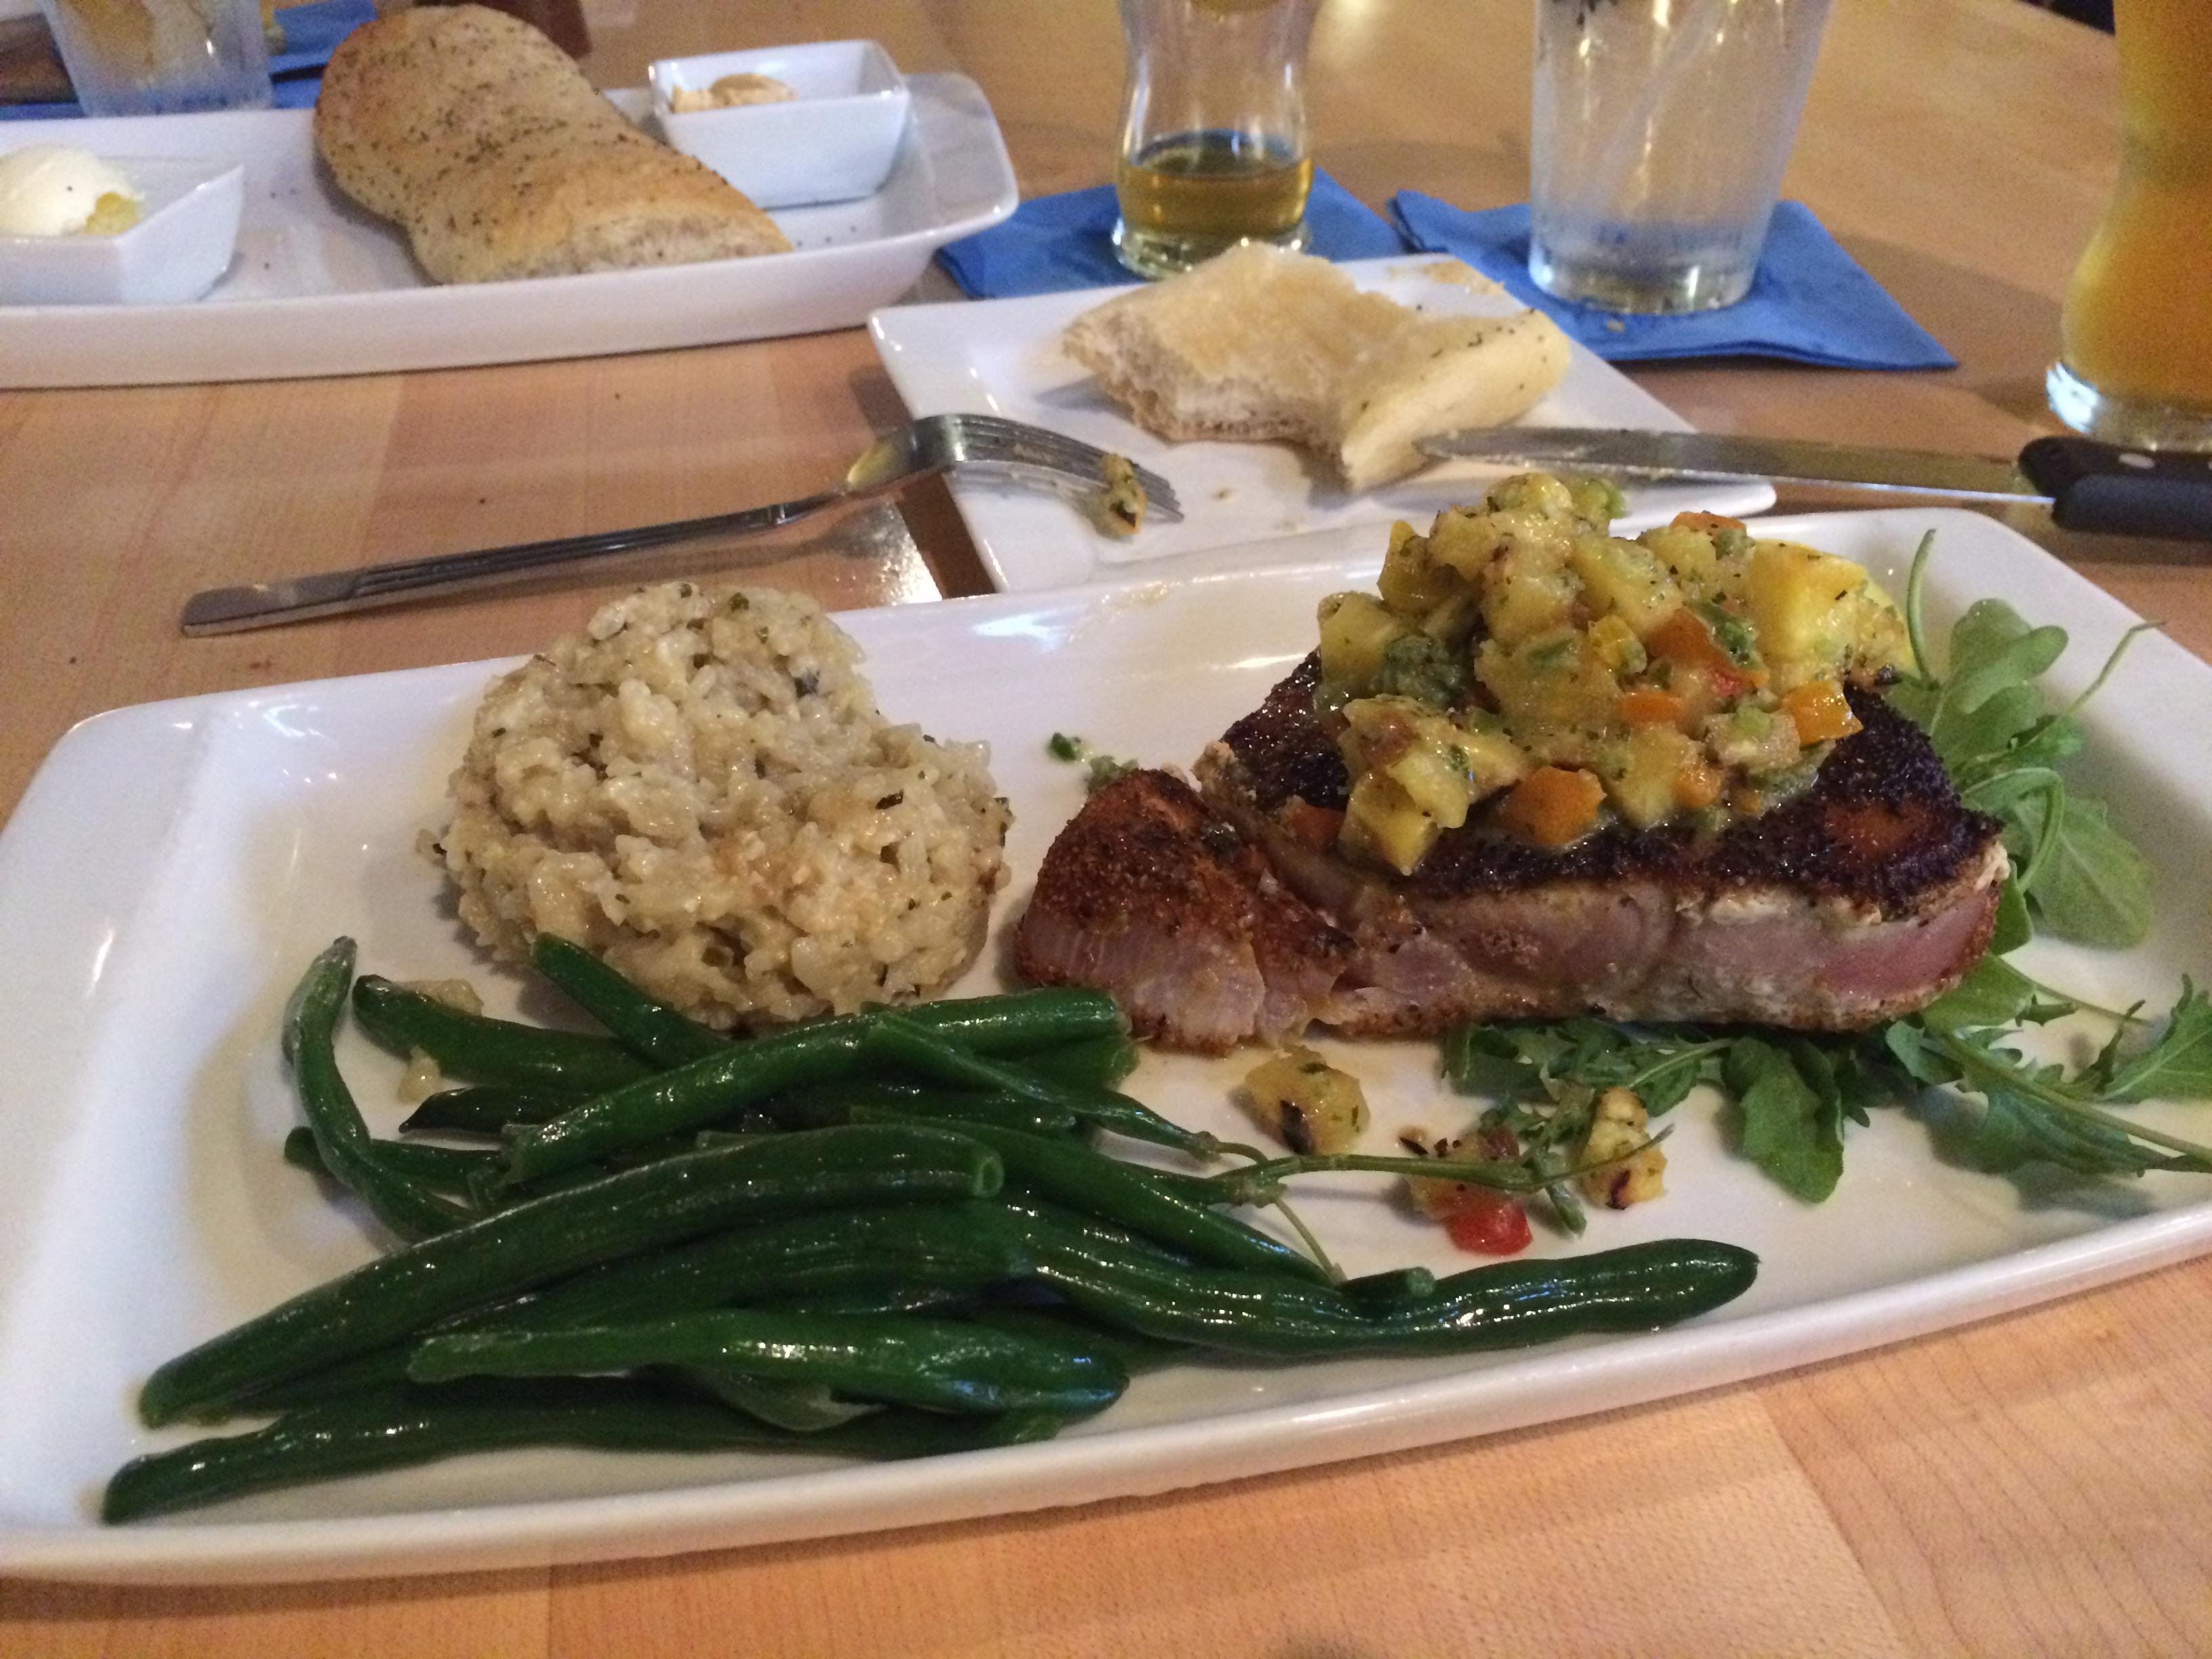 Steak dinner on fancy plate at Olivia's Chop House